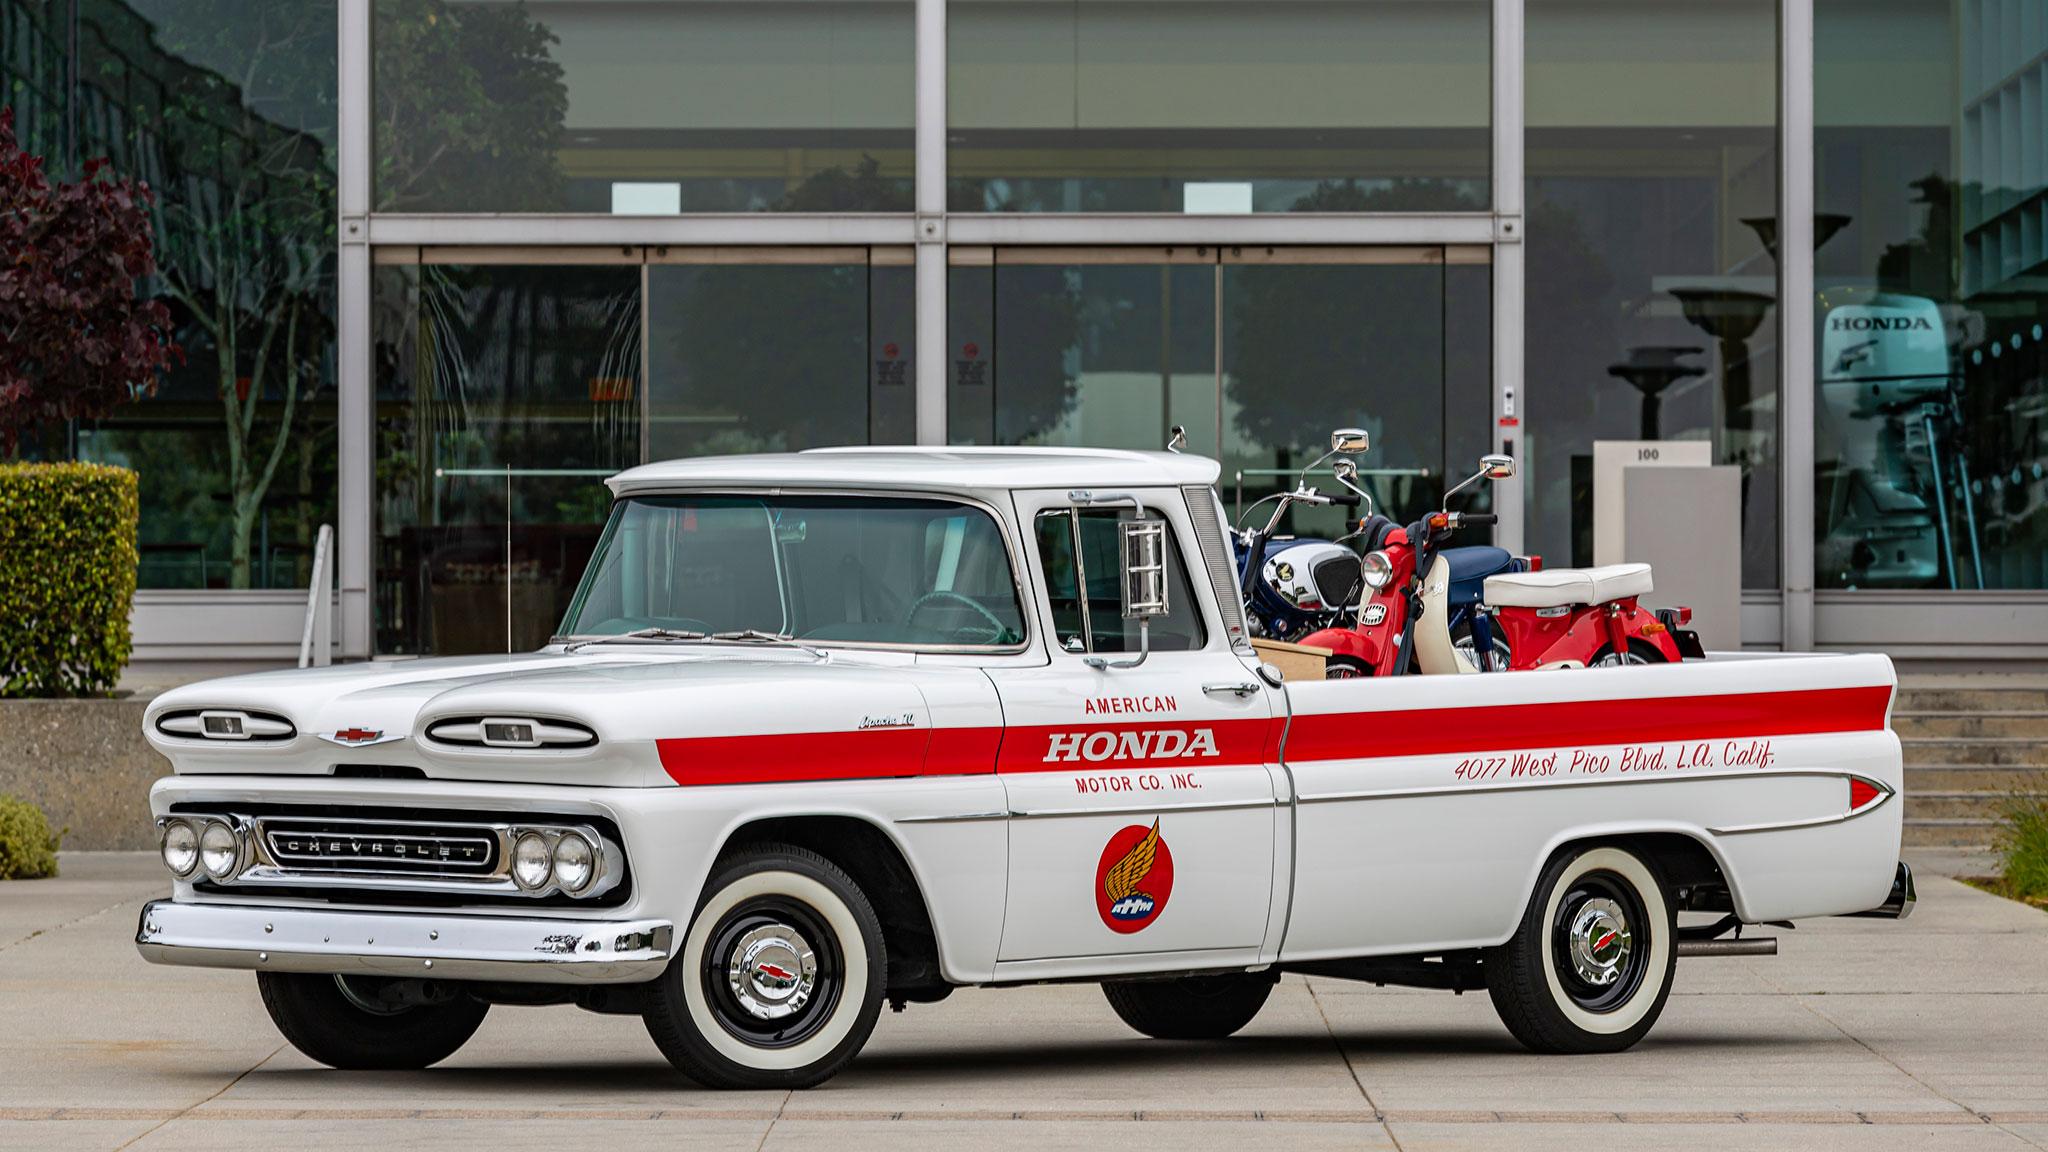 Honda Celebrates Its Heritage by Restoring Chevy Pickup | Automobile